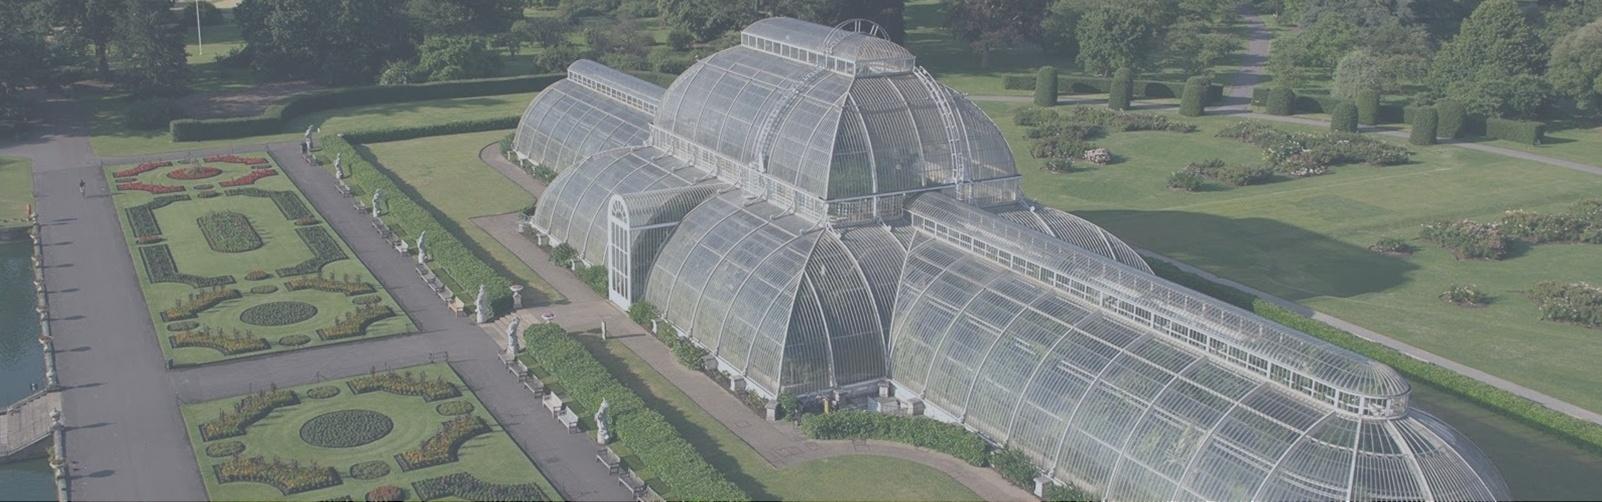 Kew Banner-139346-edited.jpg